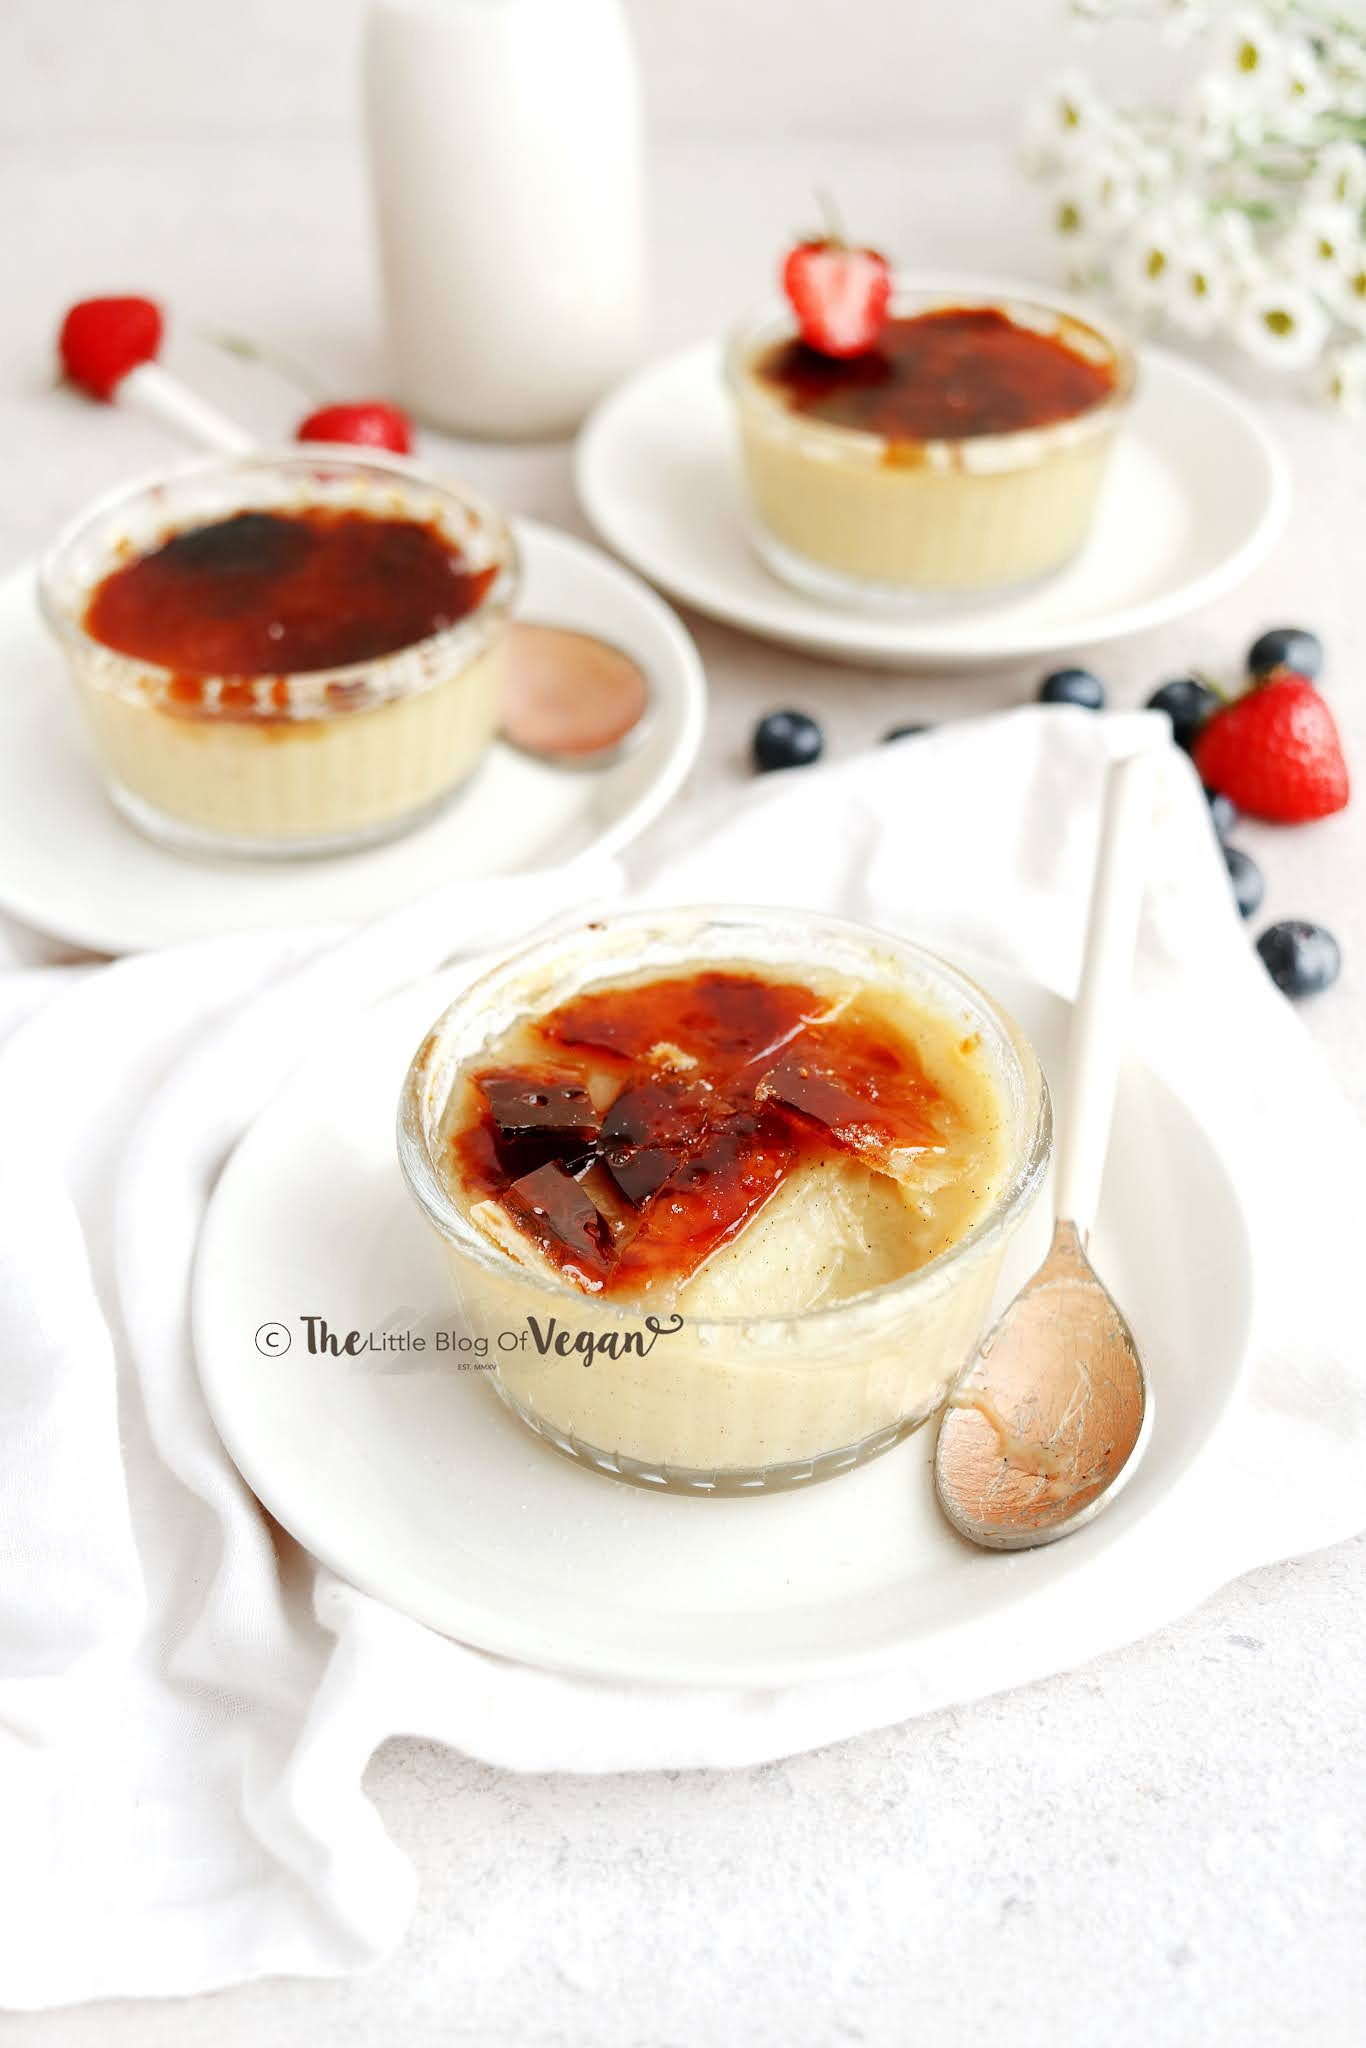 Creme-brulee-desserts-in-glass-ramekins